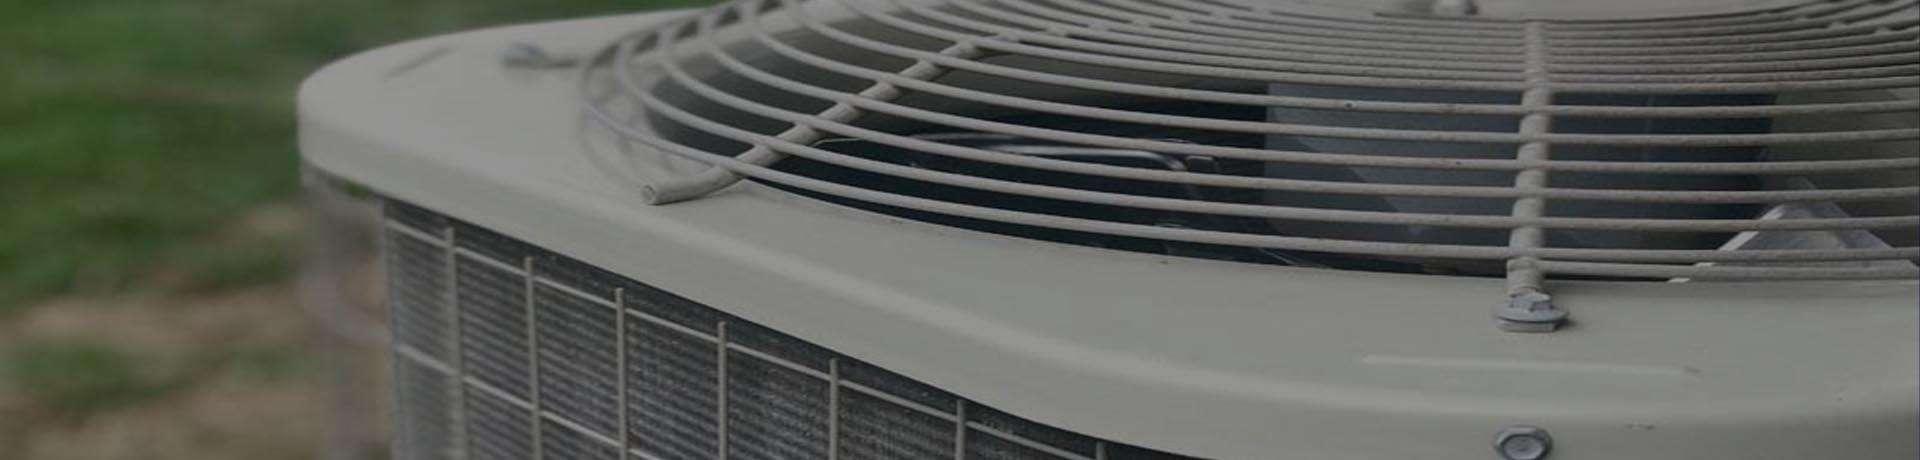 Heat Pump Loan Program banner image